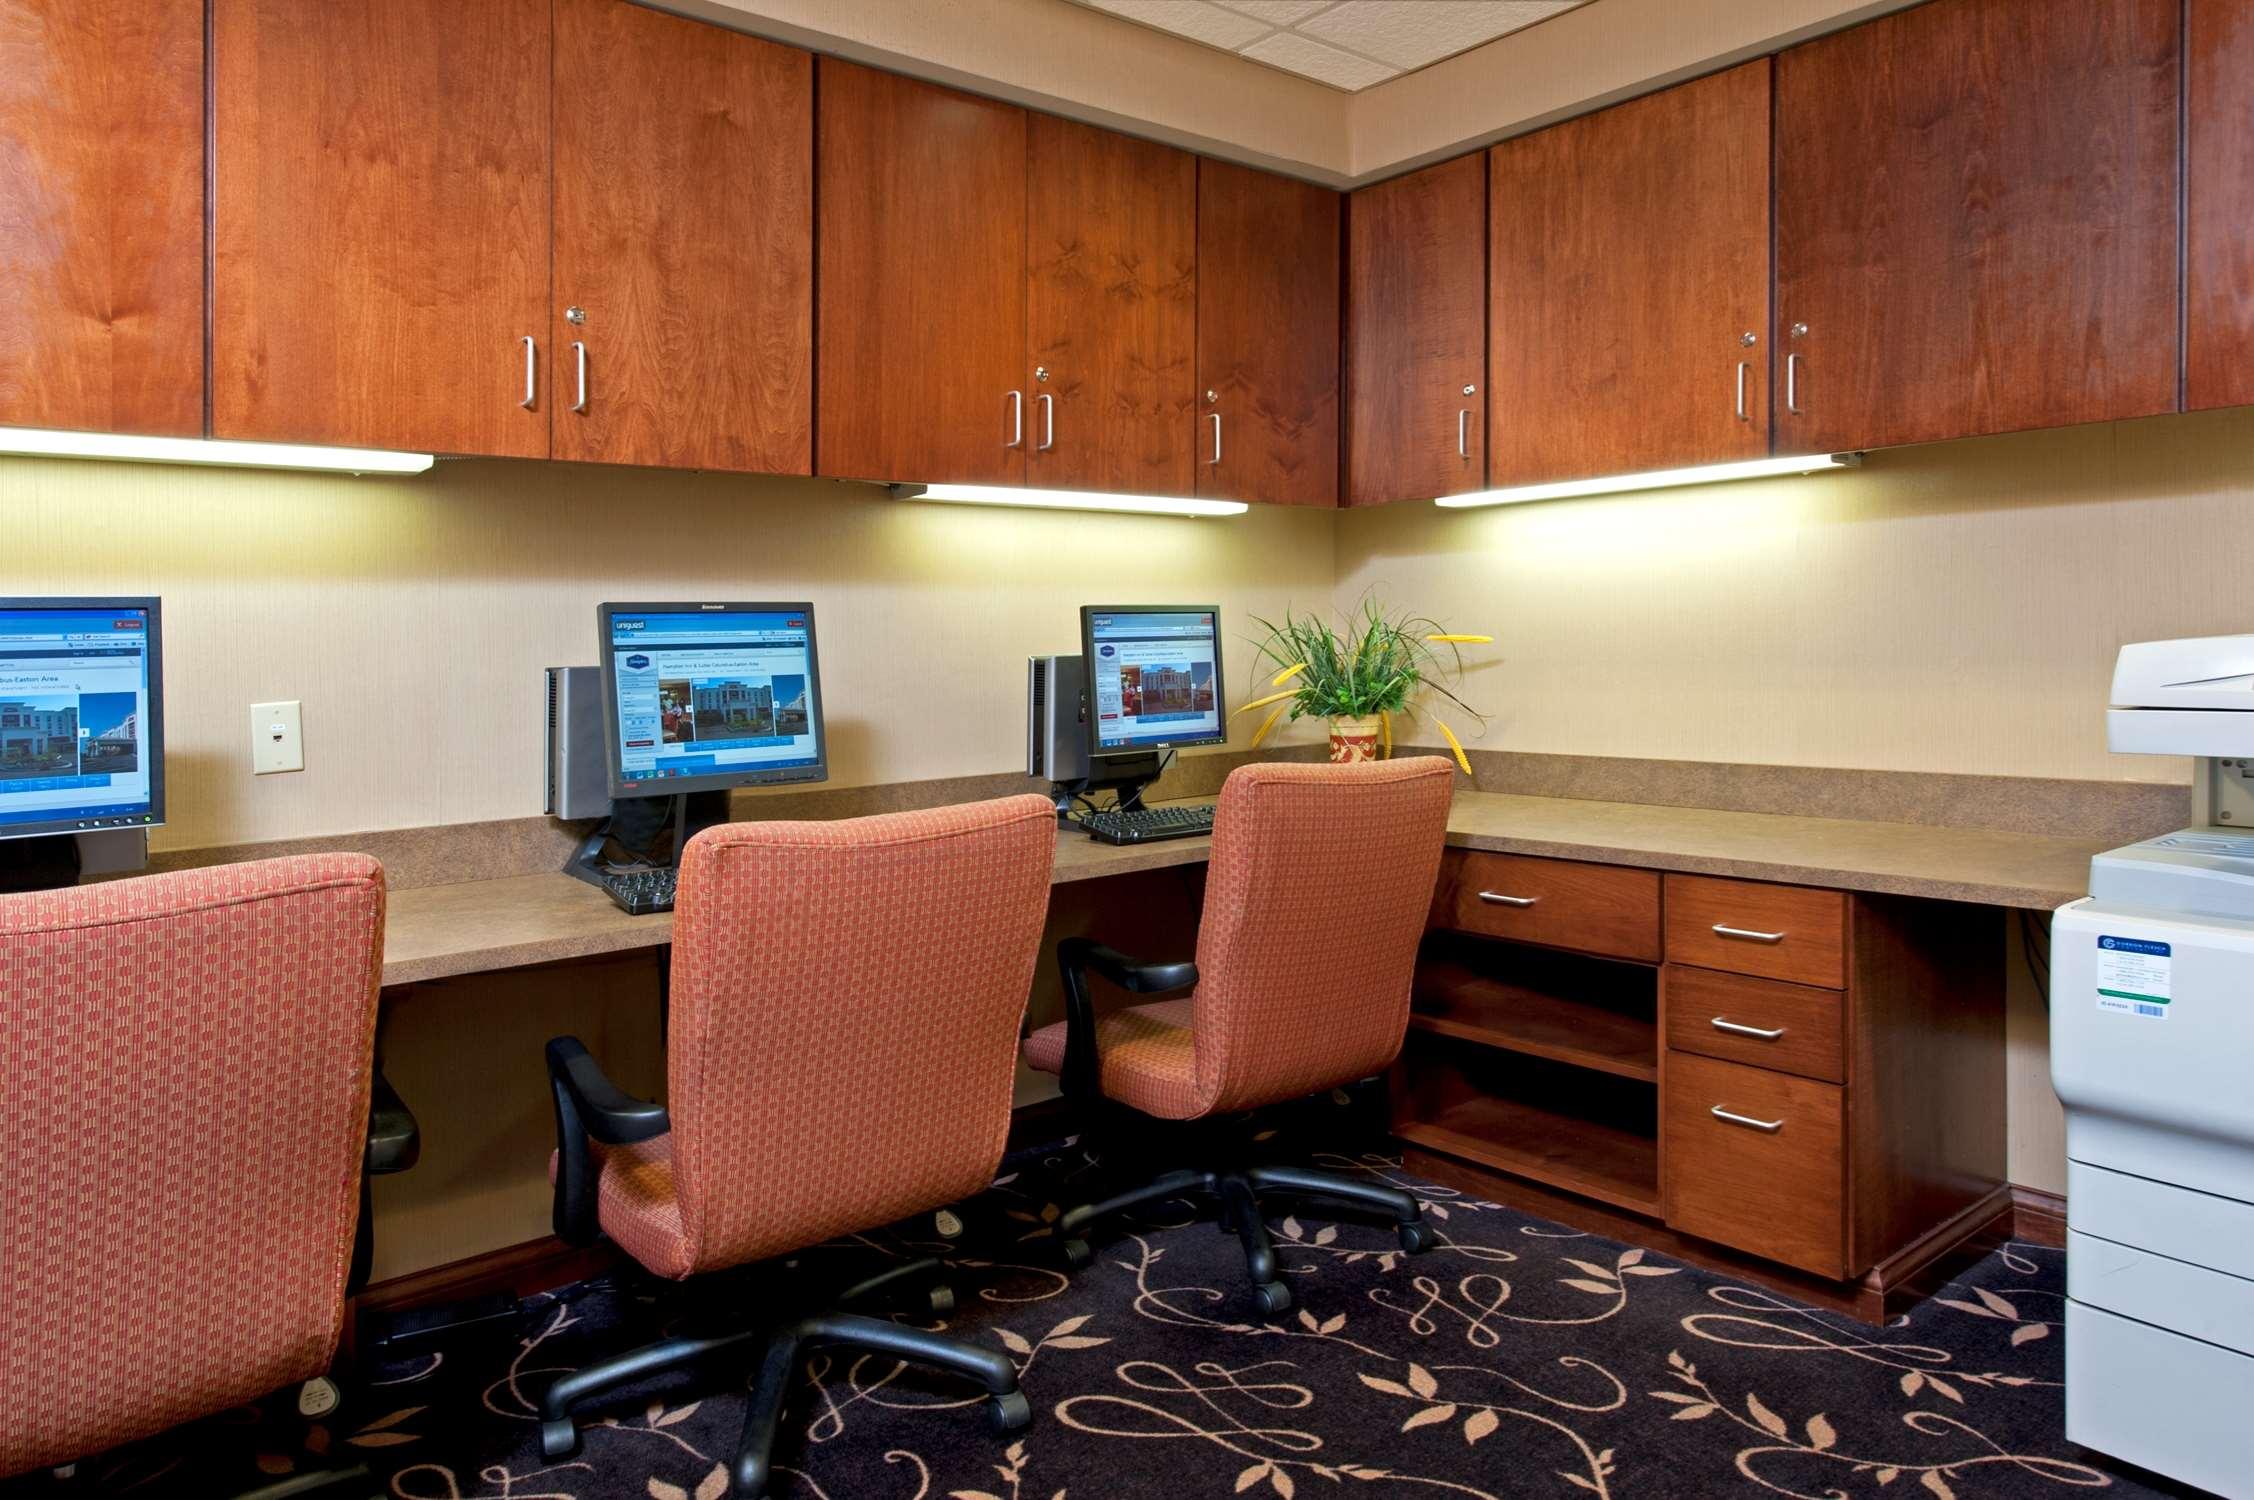 Hampton Inn & Suites Columbus-Easton Area image 64